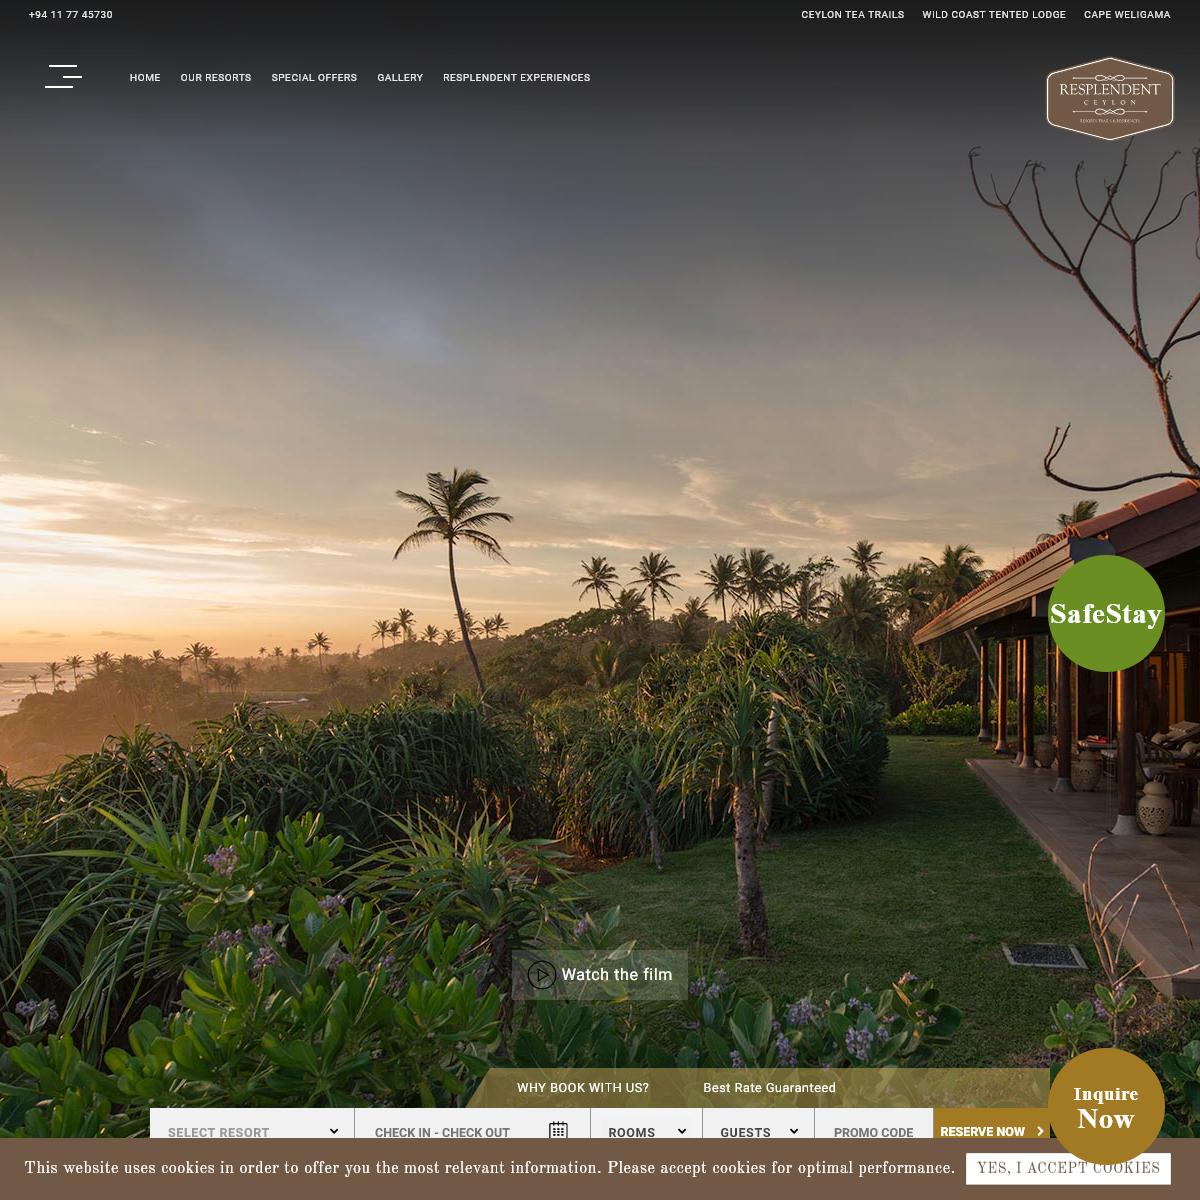 Luxury Hotels & Resorts in Sri Lanka - Resplendent Ceylon - Official Website